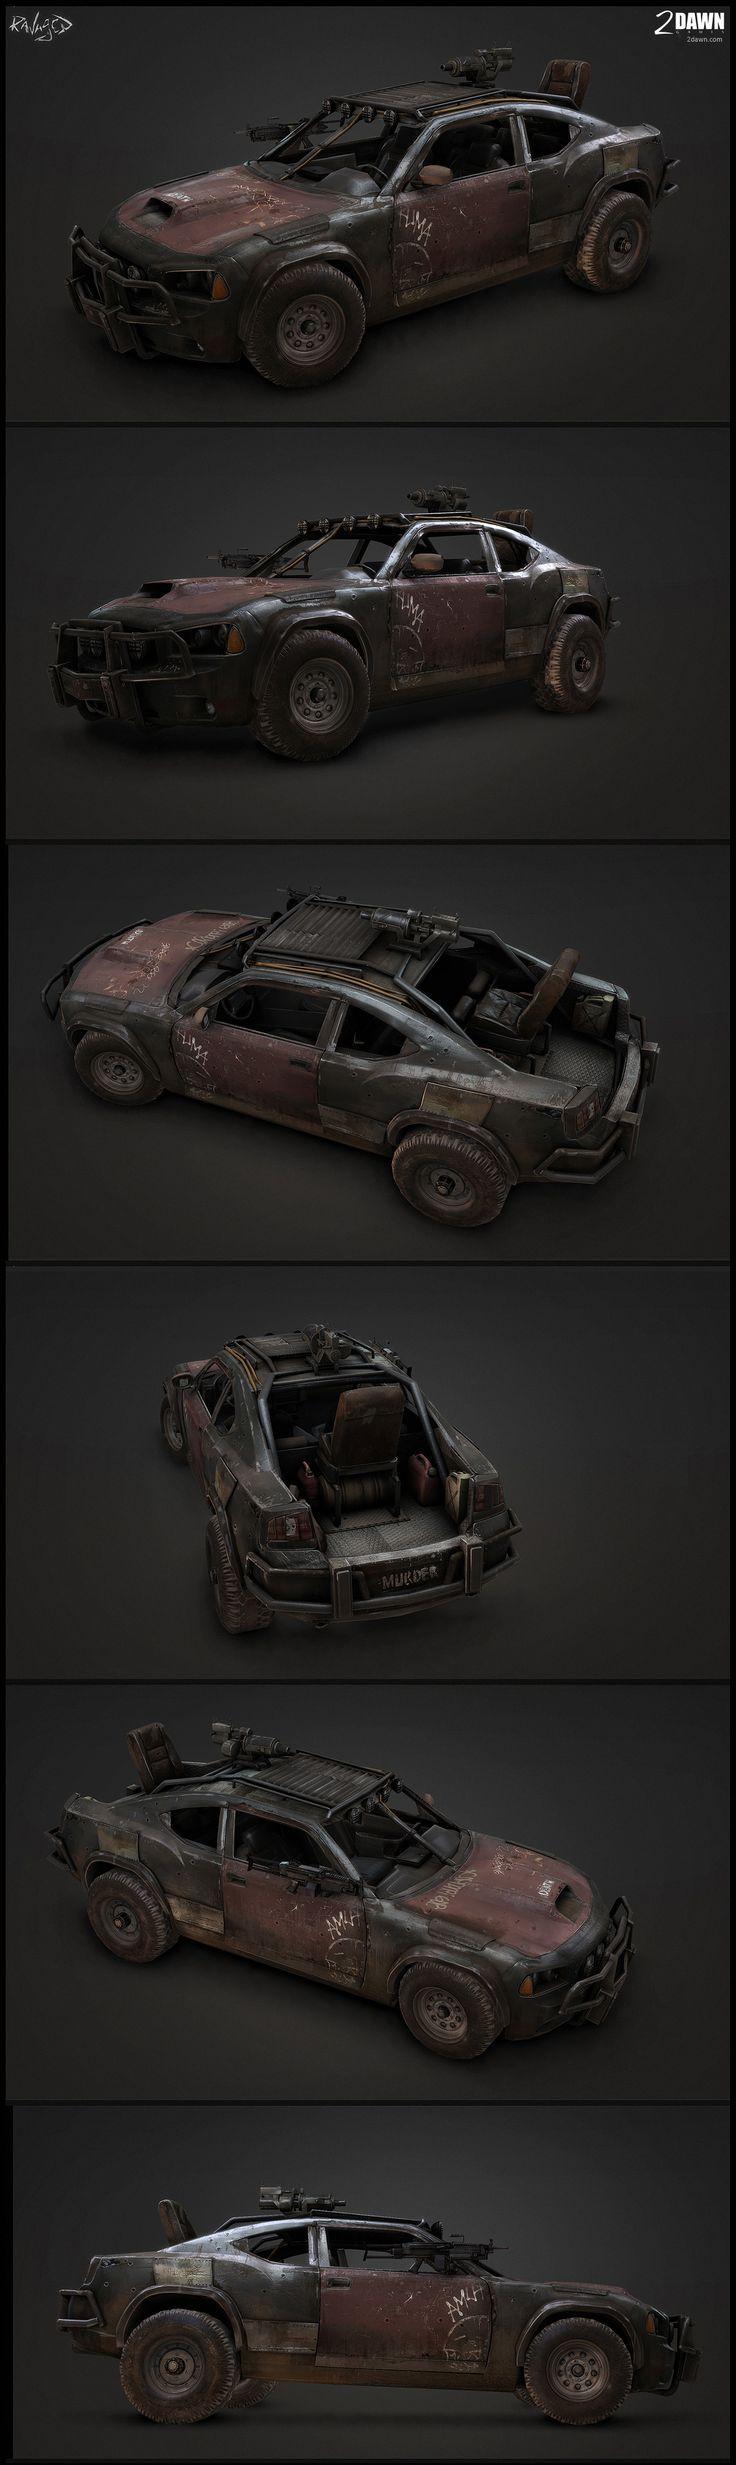 (7) Ravaged Vehicle (new vehicle sample) - Polycount Forum | Apoca-whaaaaaaat? | Pinterest | Зомби-апокалипсис, Зомби и Безумный Макс